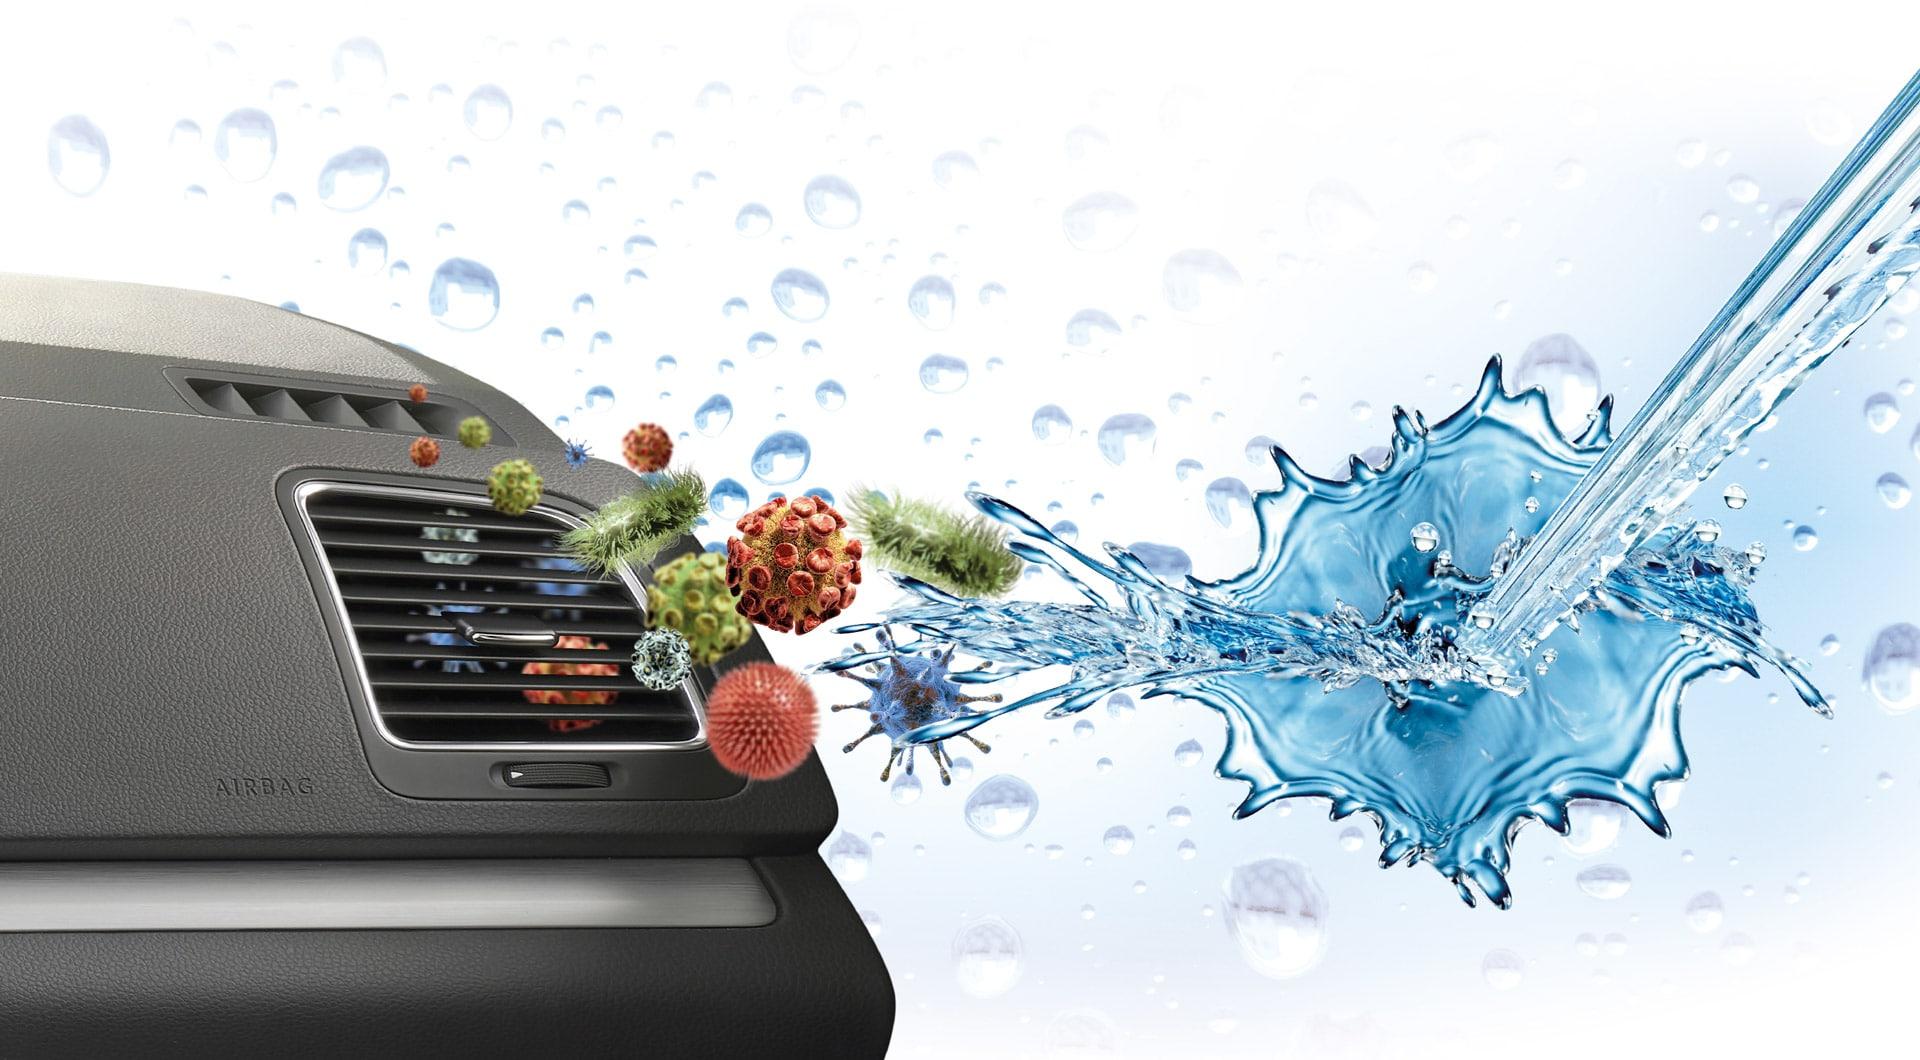 Klimaanlage Bakterien Splash